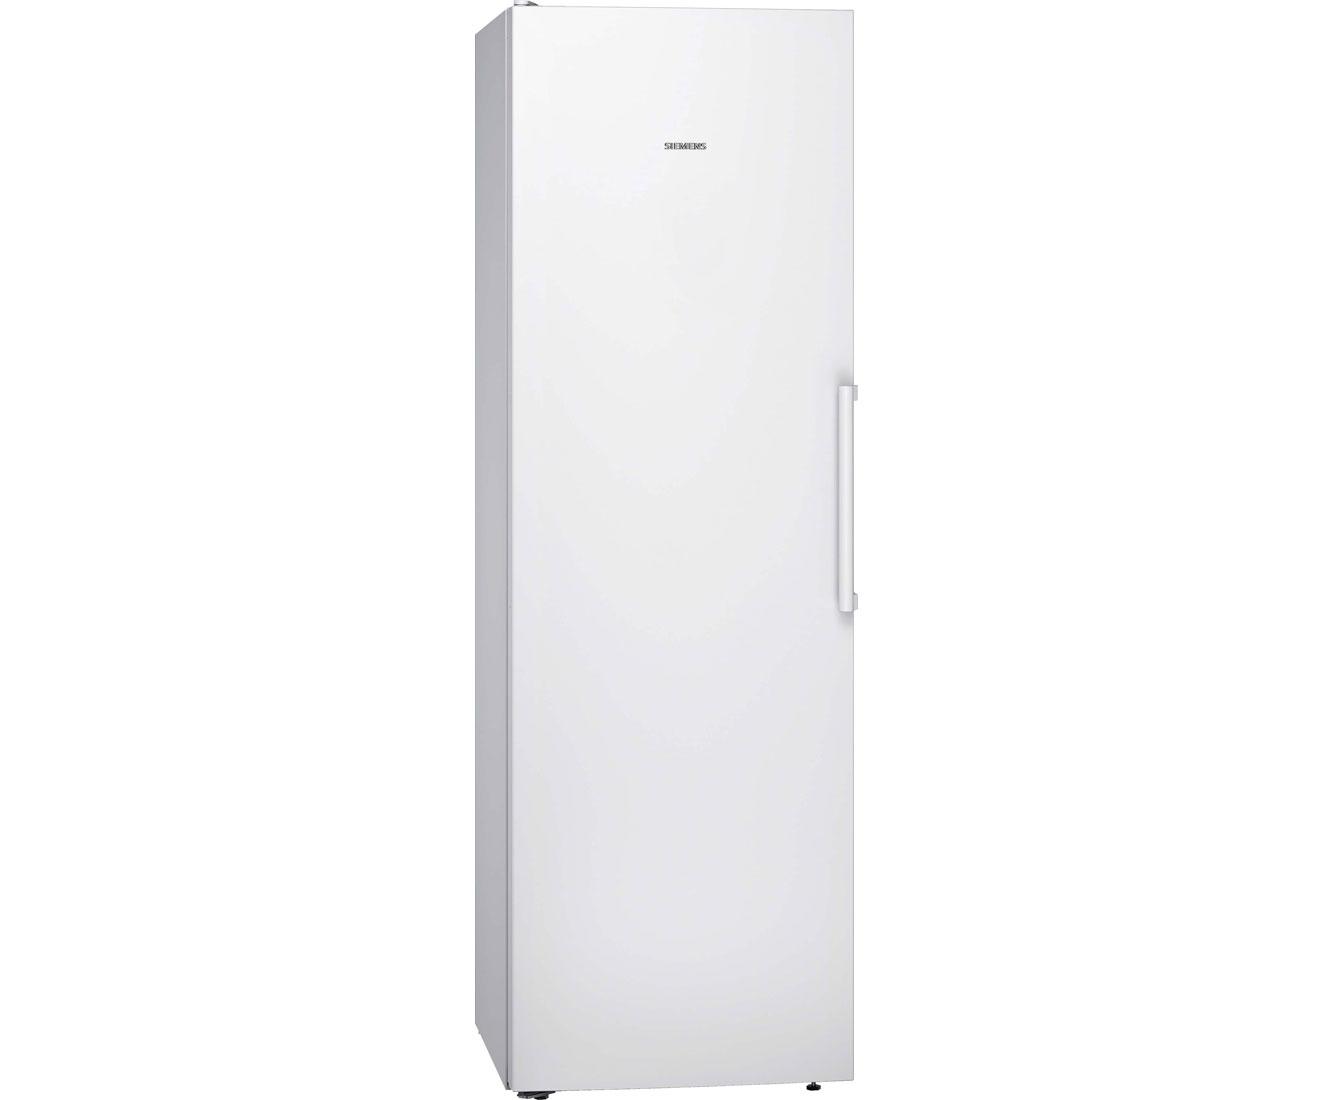 Retro Kühlschrank Siemens : Siemens iq300 ks36vvw3p kühlschrank weiß a